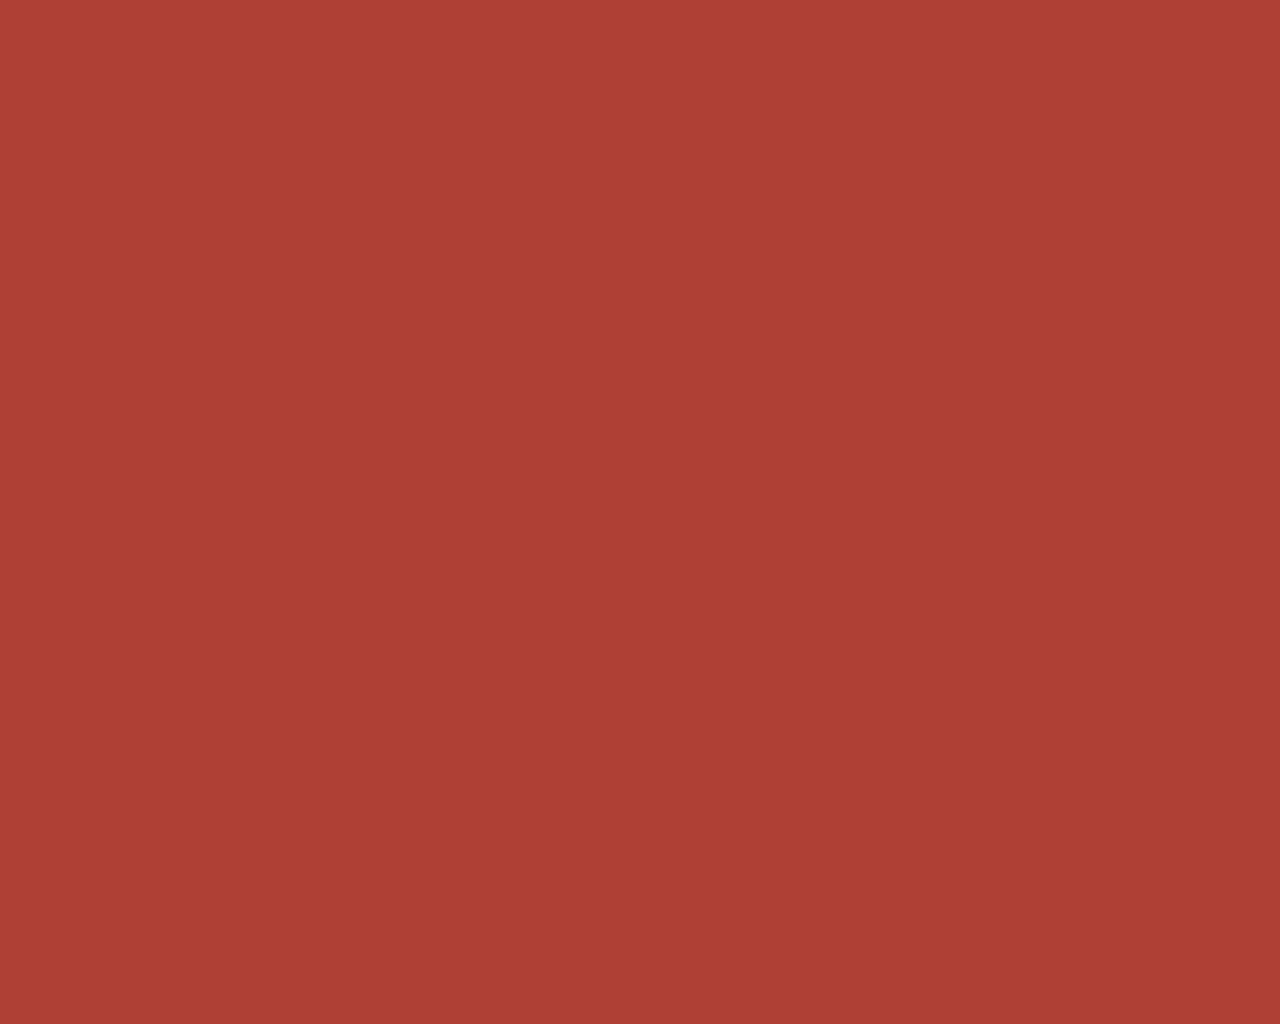 1280x1024 Medium Carmine Solid Color Background